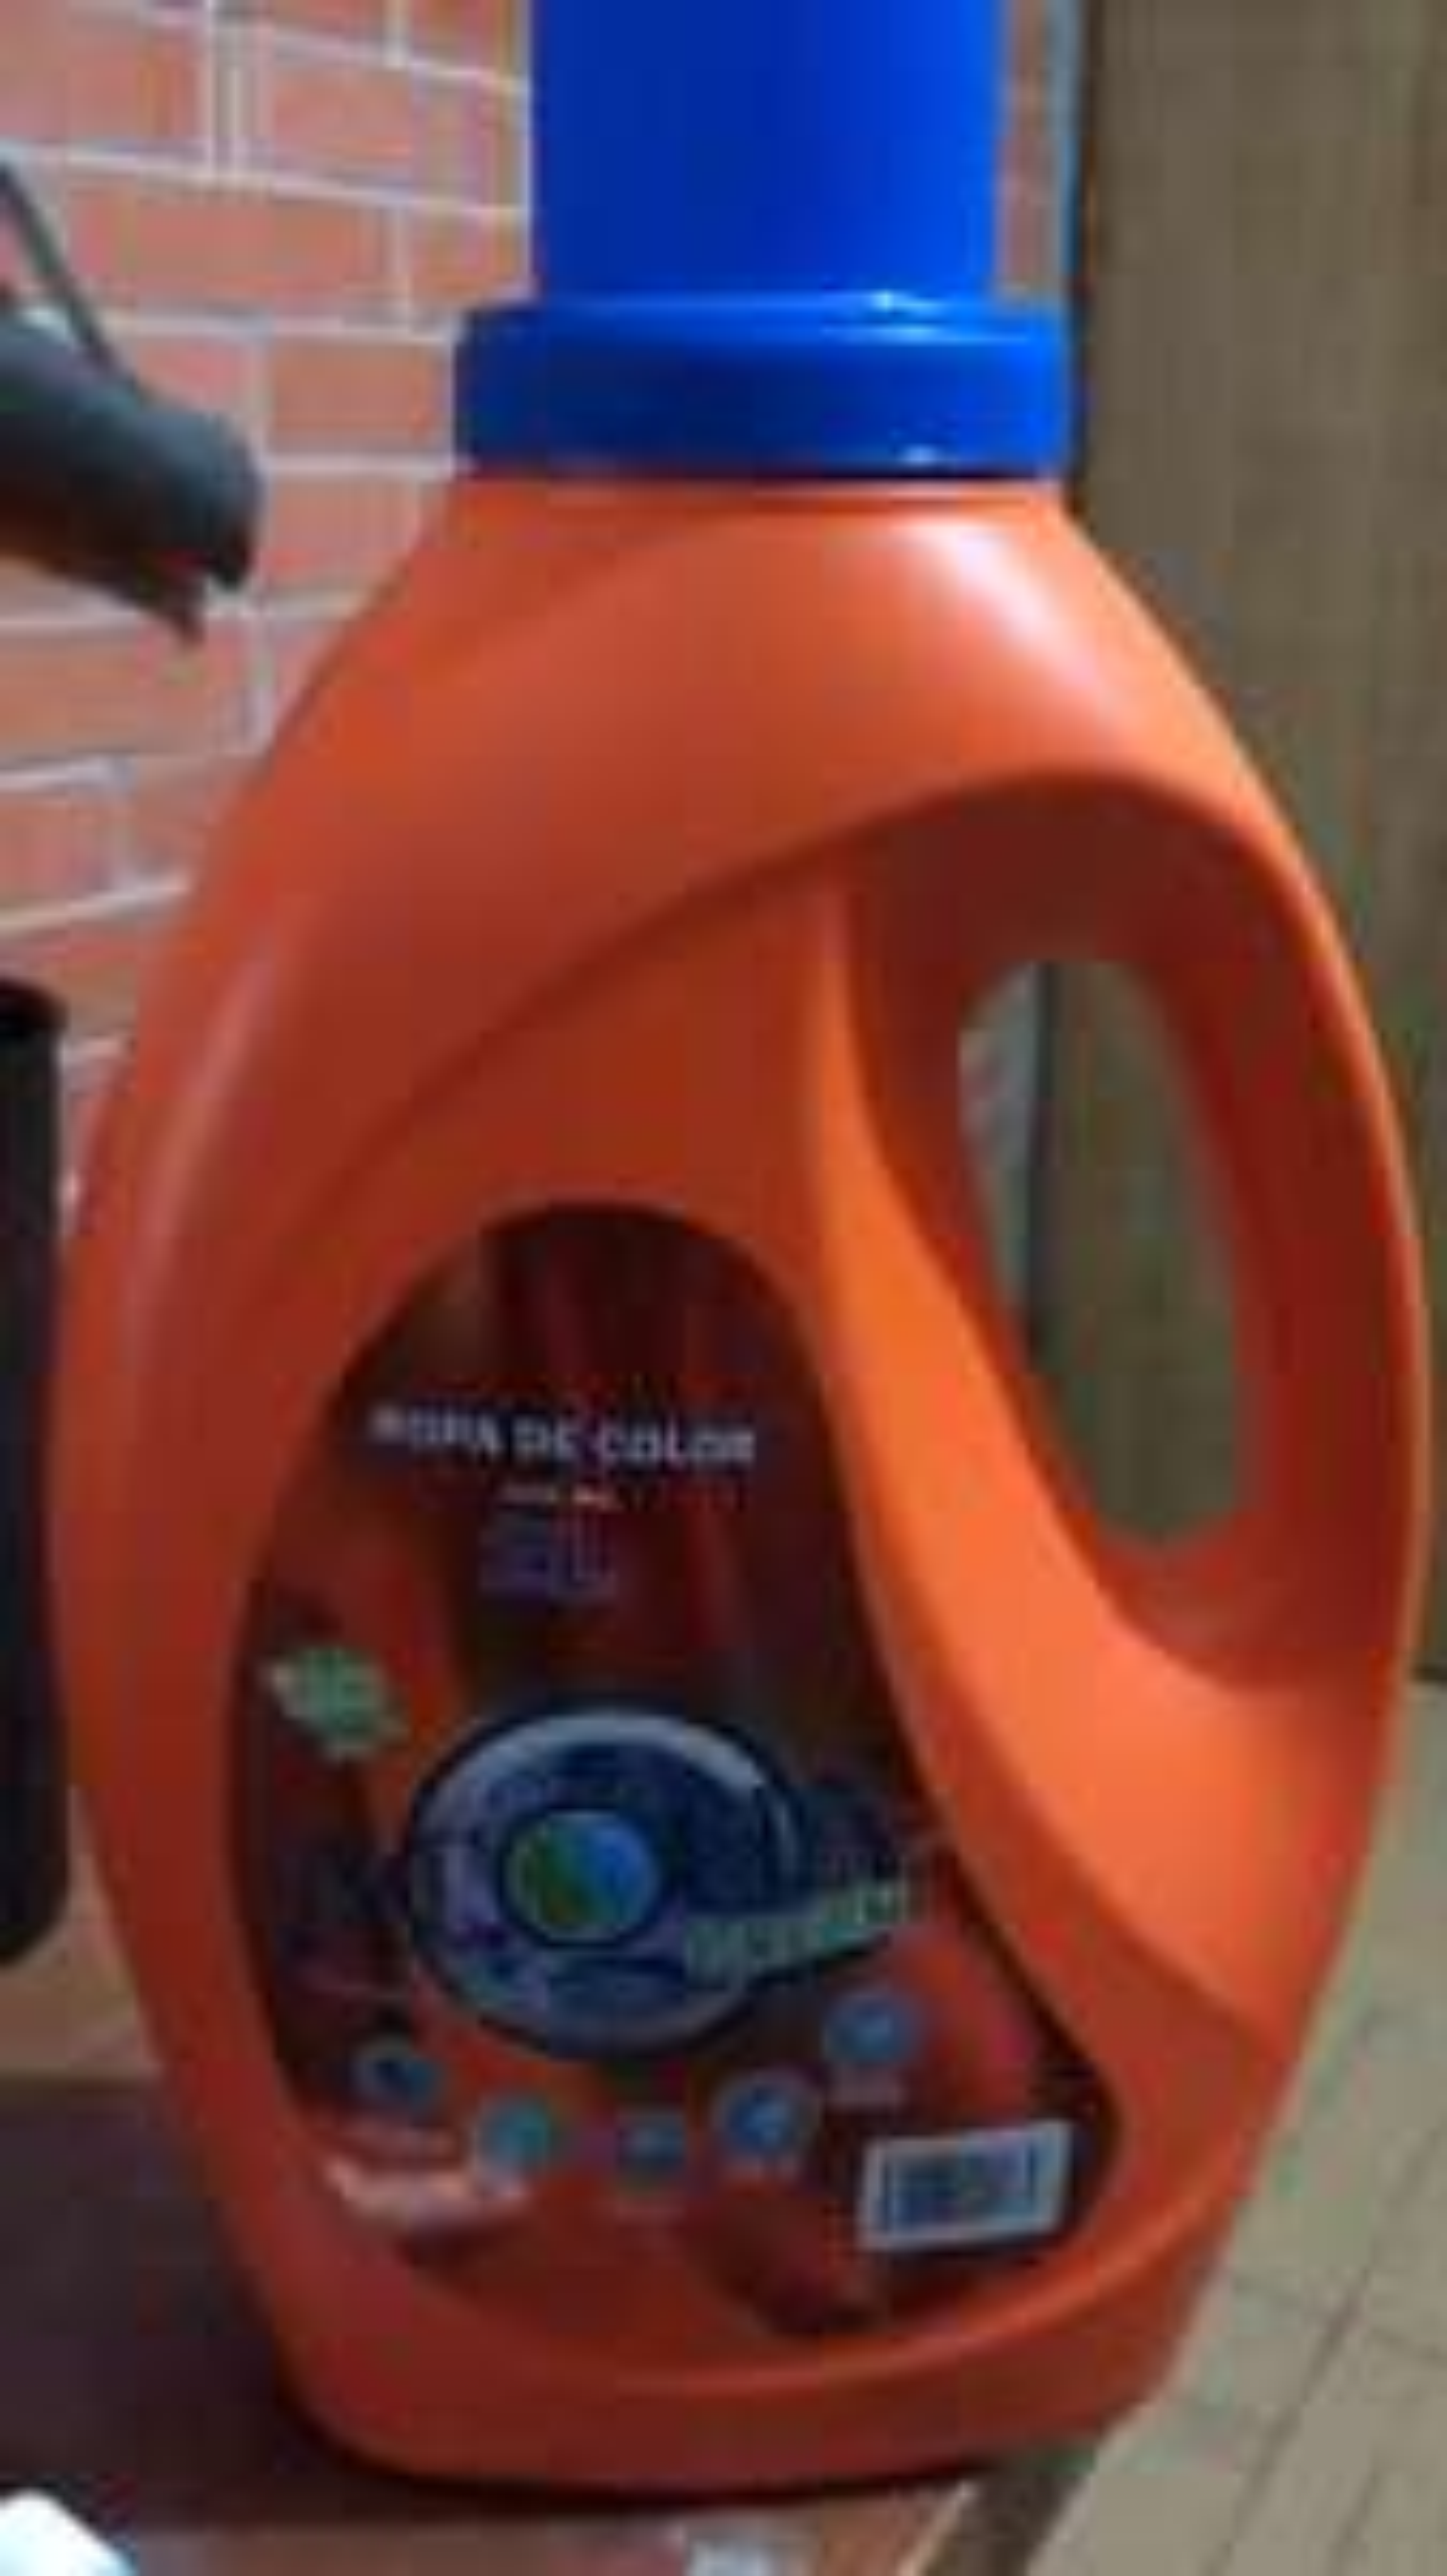 Walmart Torres Lindavista: detergente líquido Acqua Green 2lt a $24.02